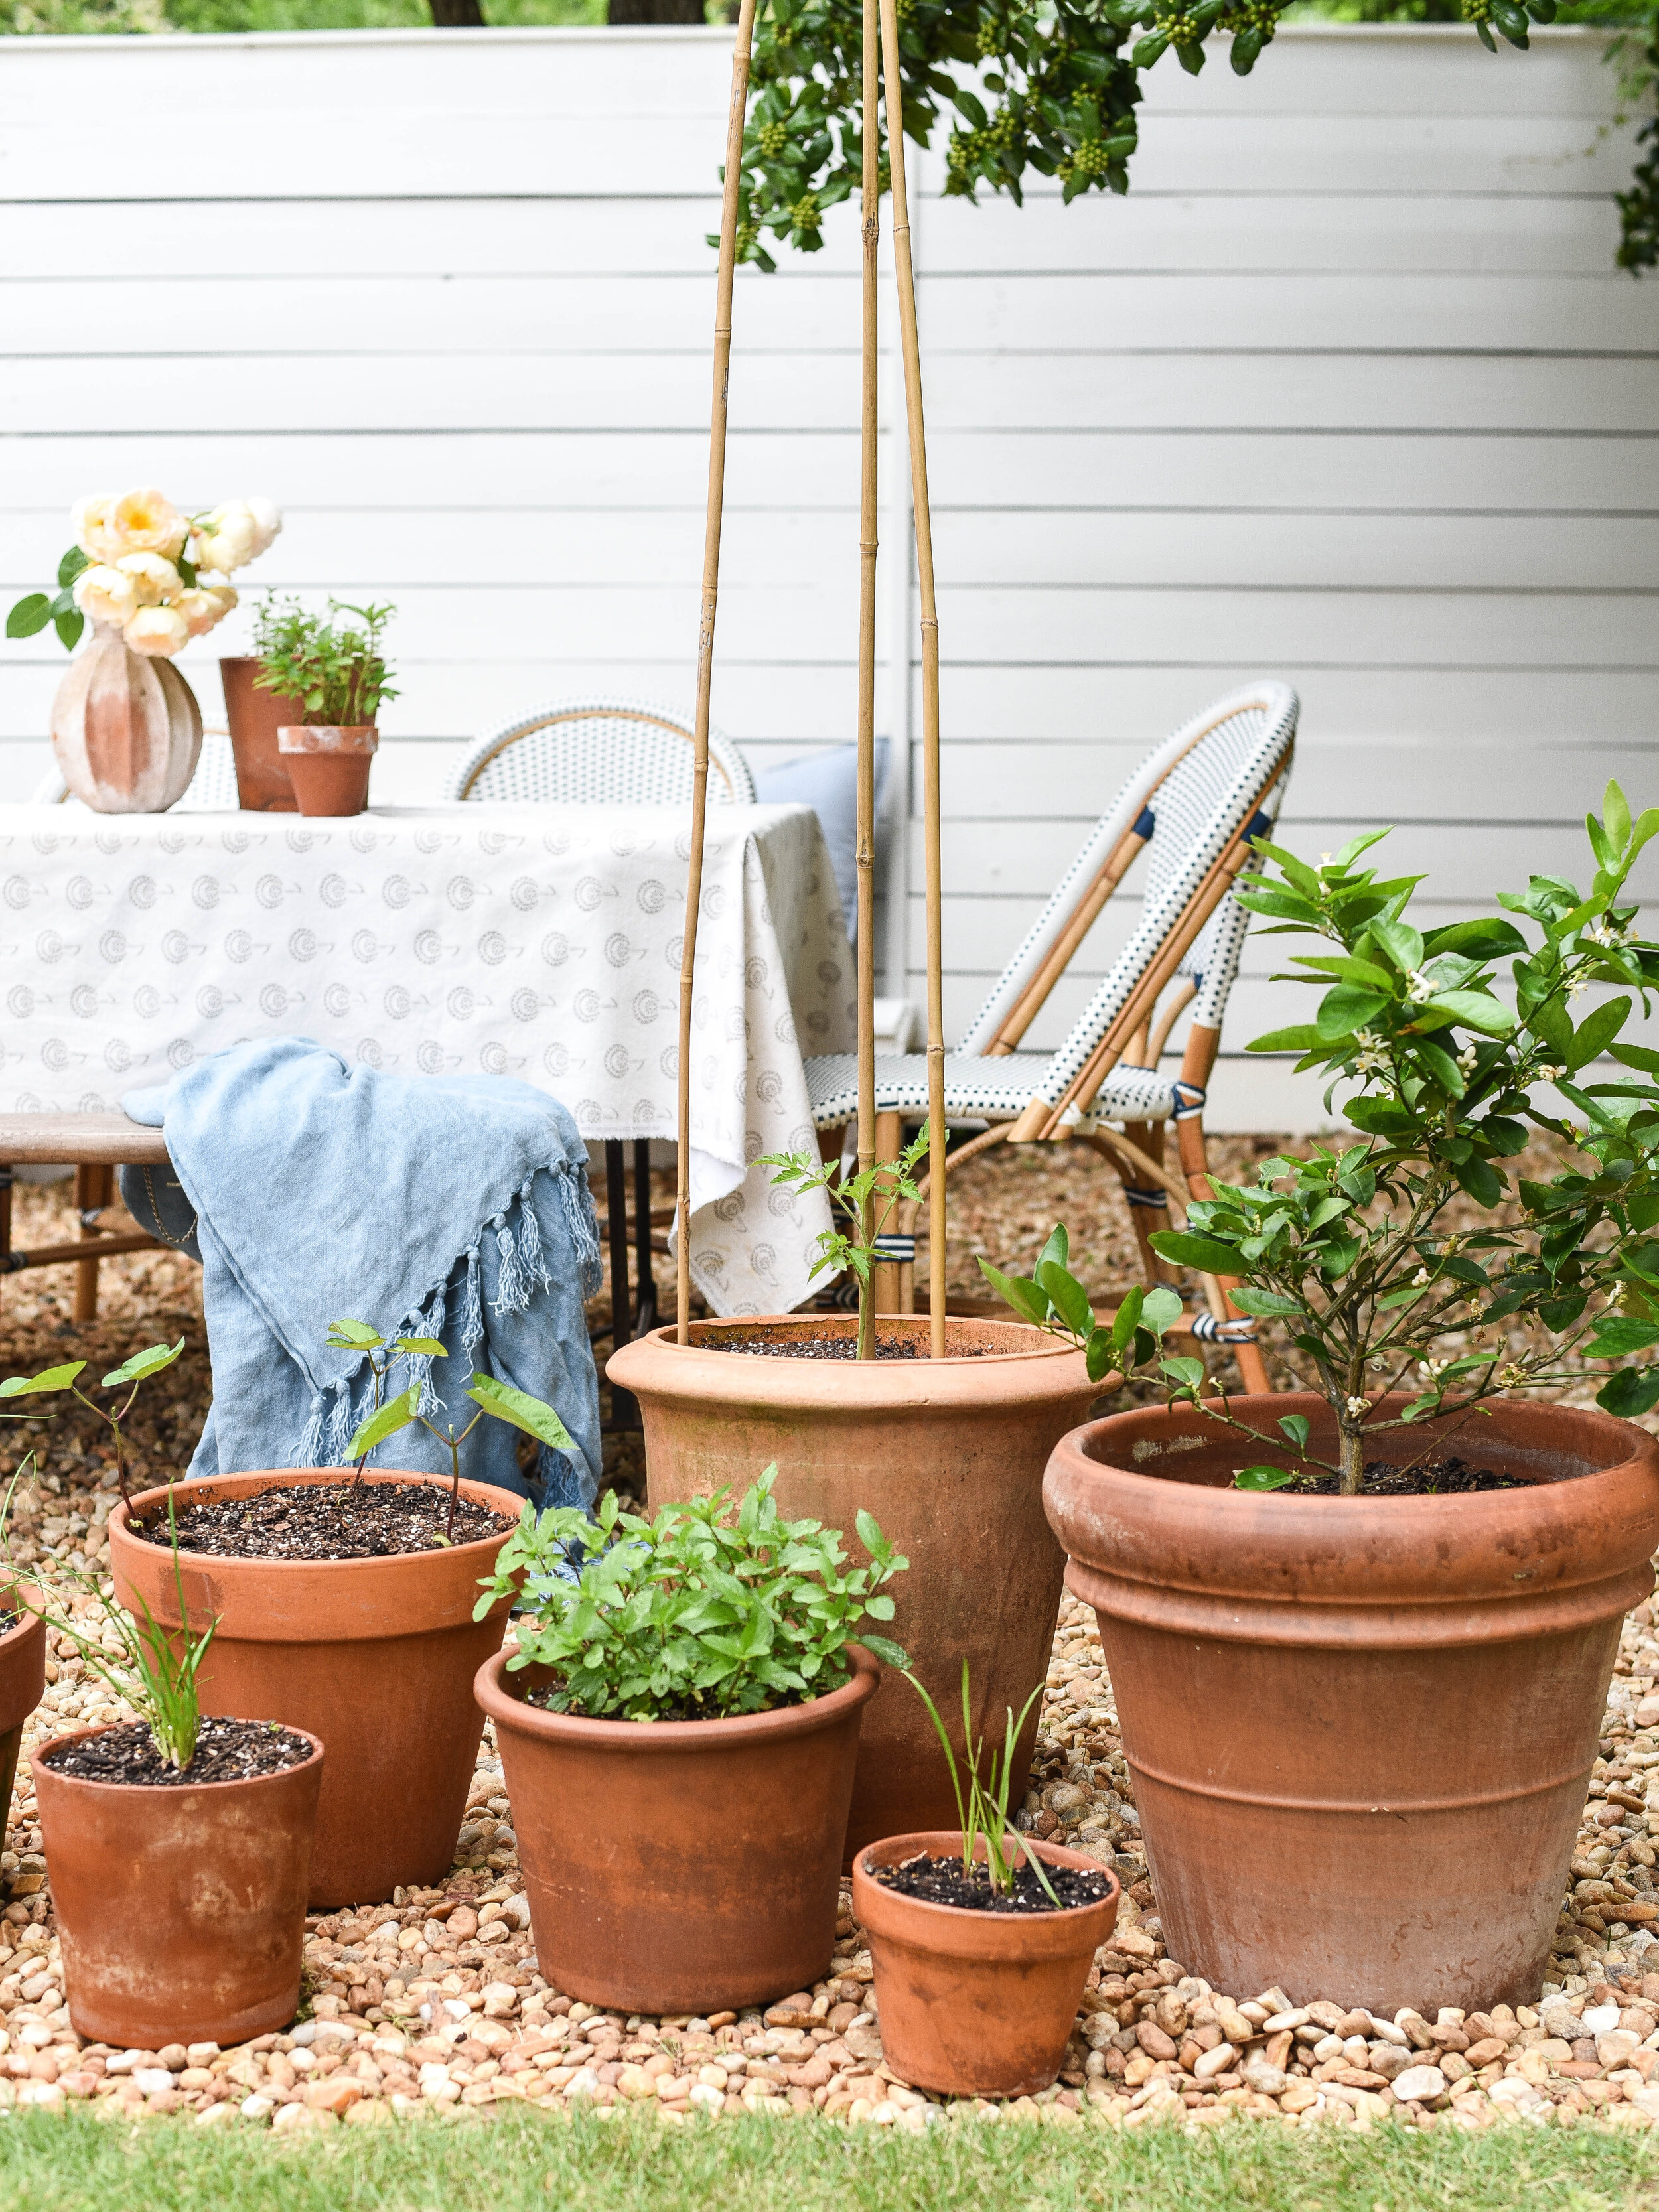 rock patio container garden by